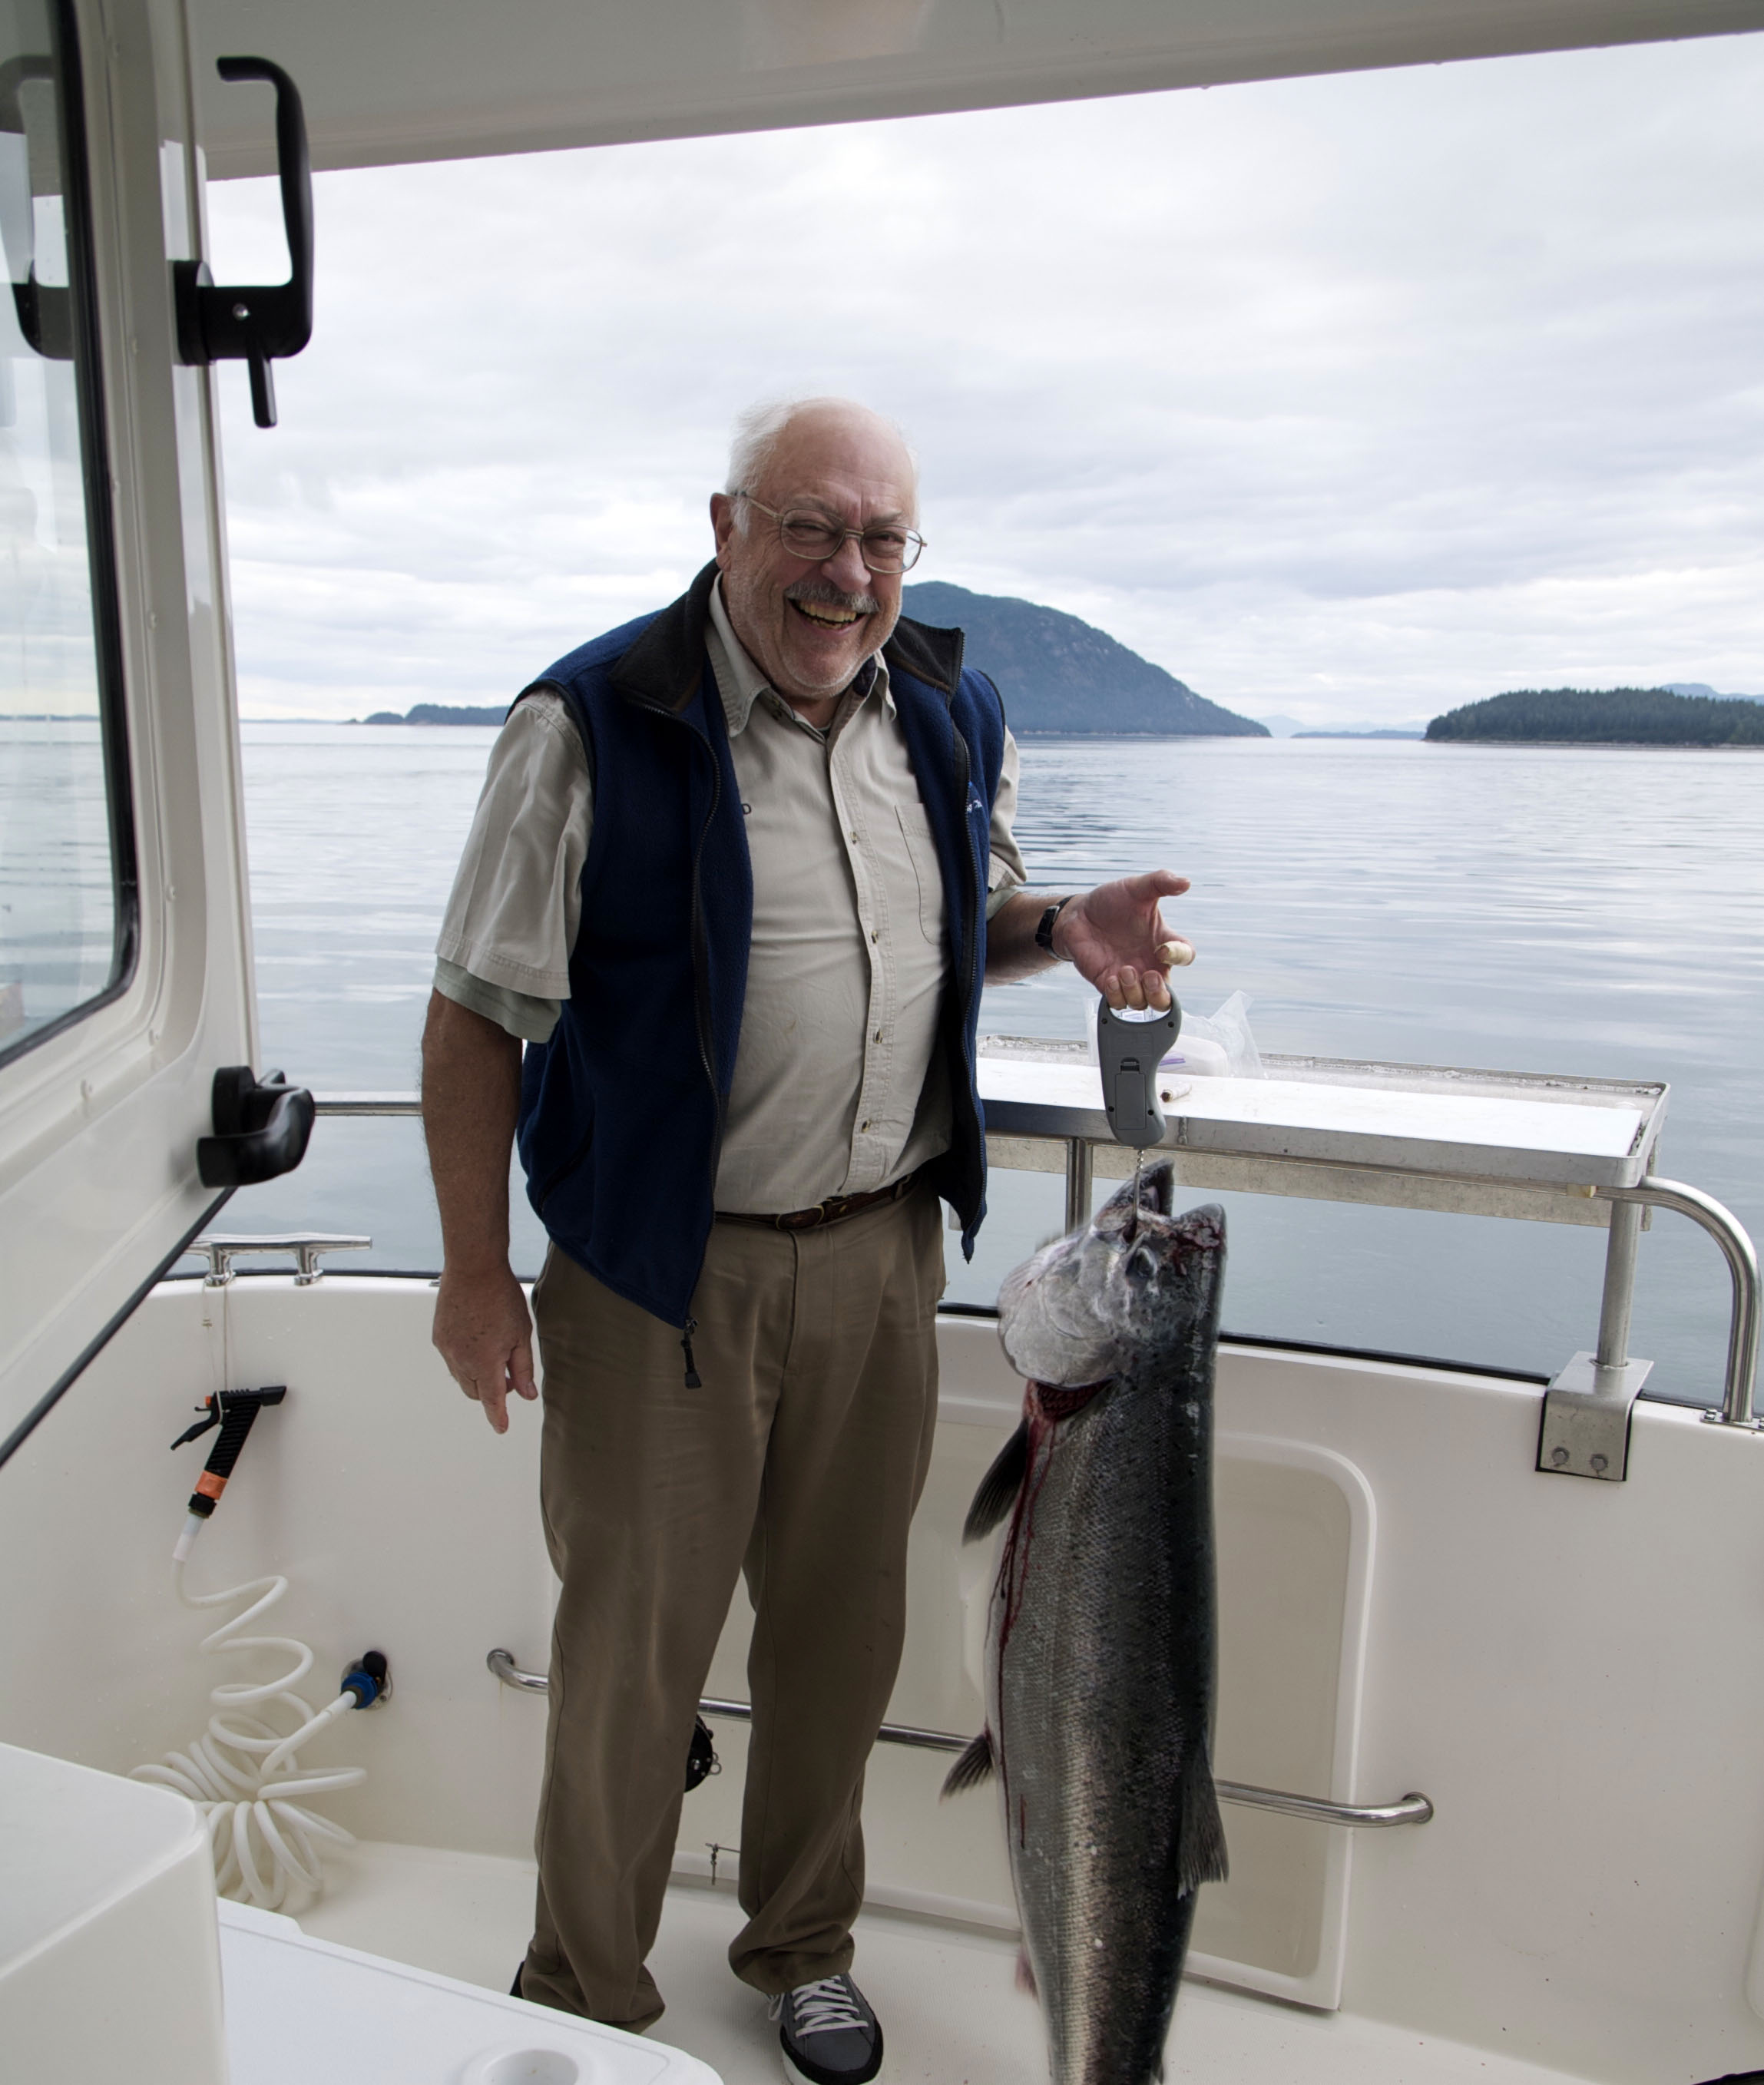 A good sized king salmon